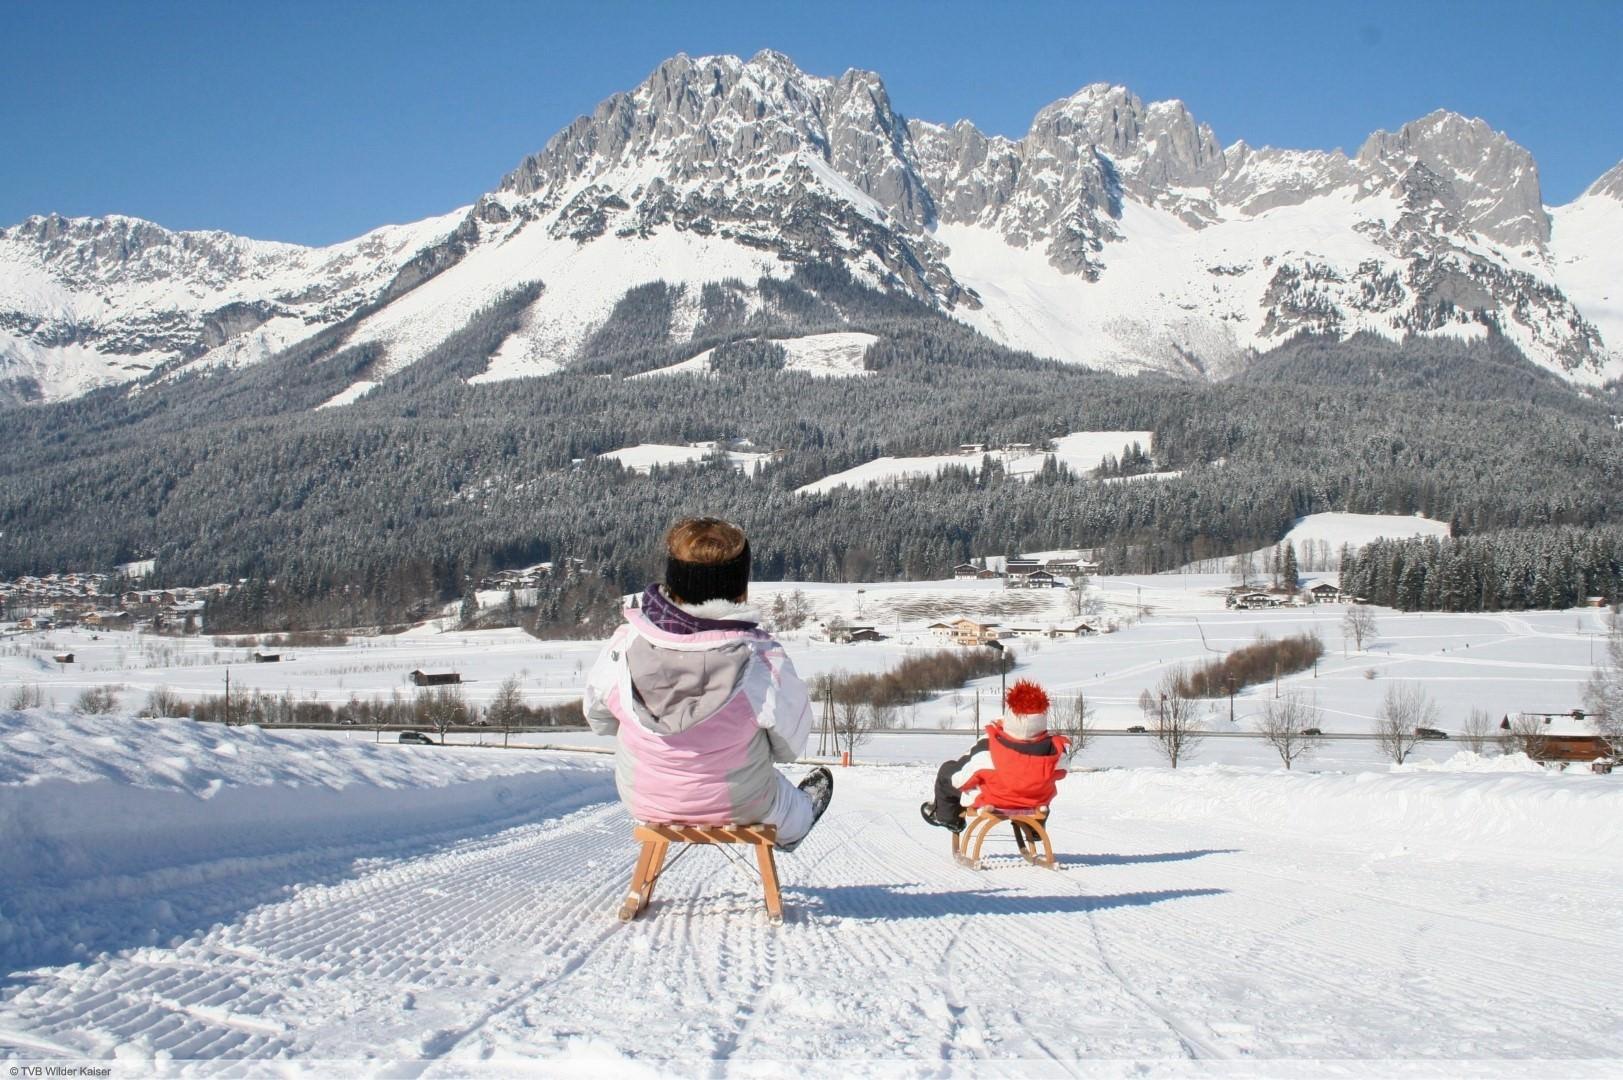 après-ski in Going